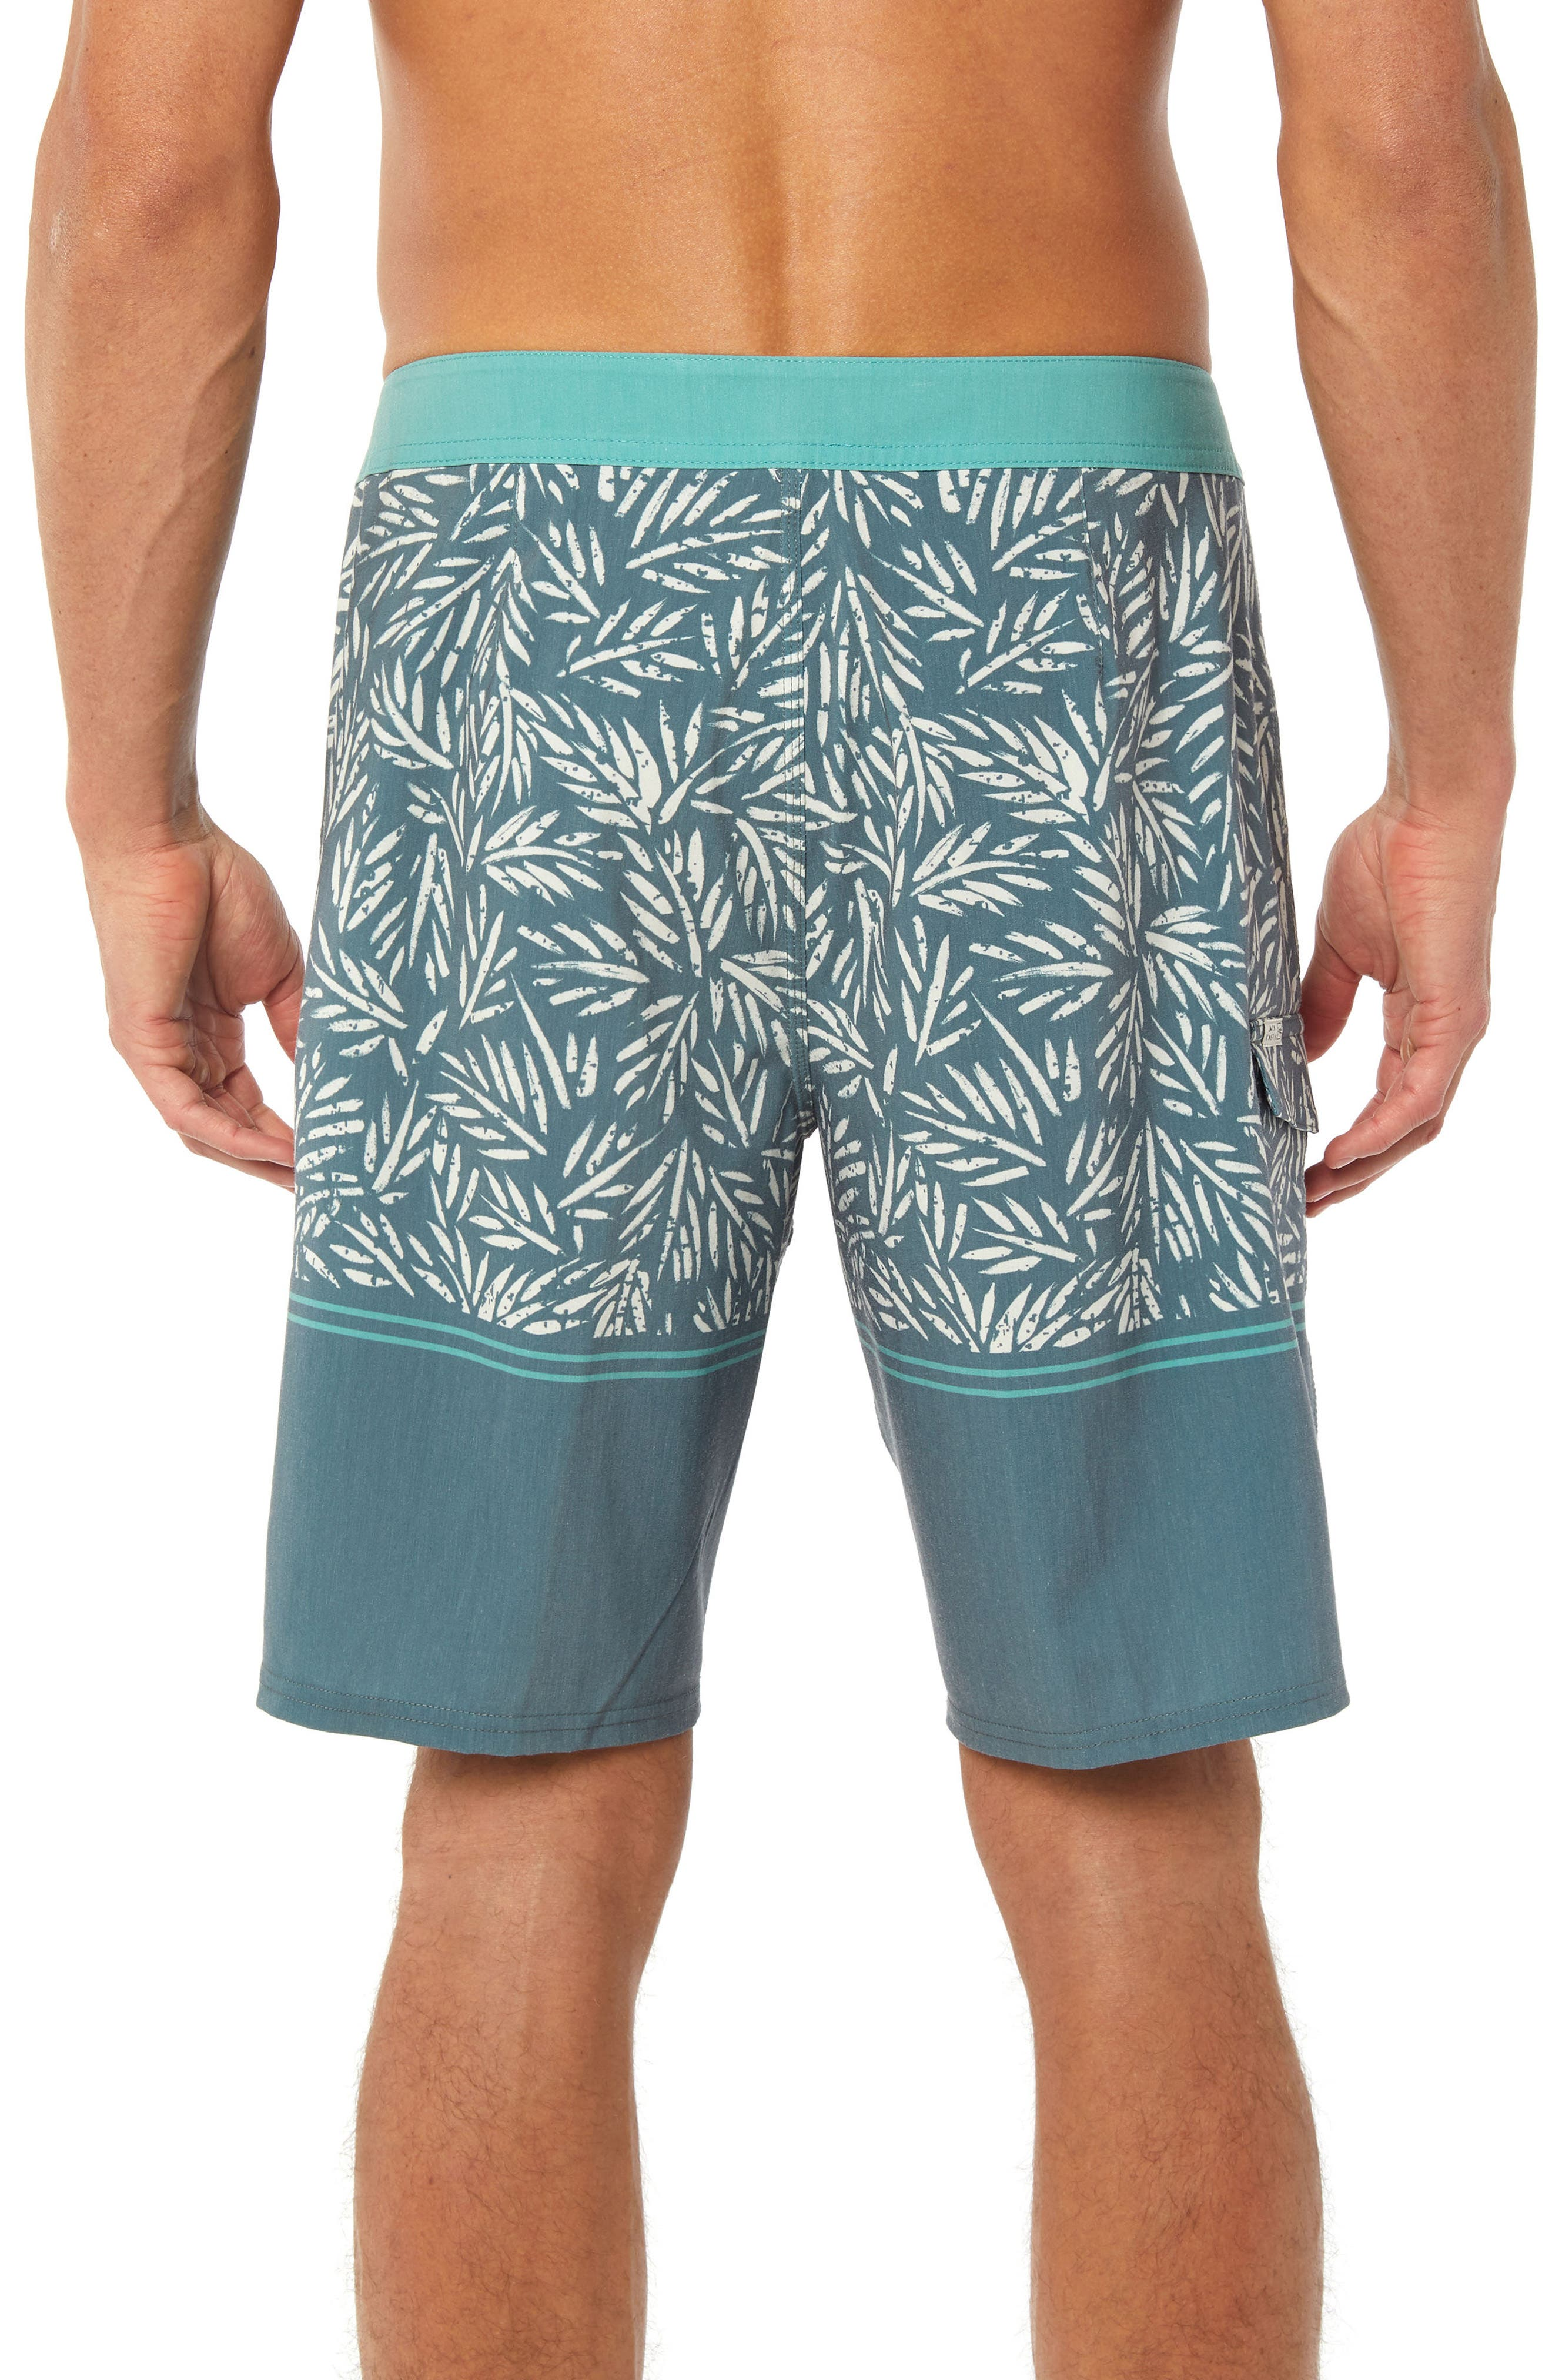 Vacay Board Shorts,                             Alternate thumbnail 2, color,                             DARK SEA GLASS